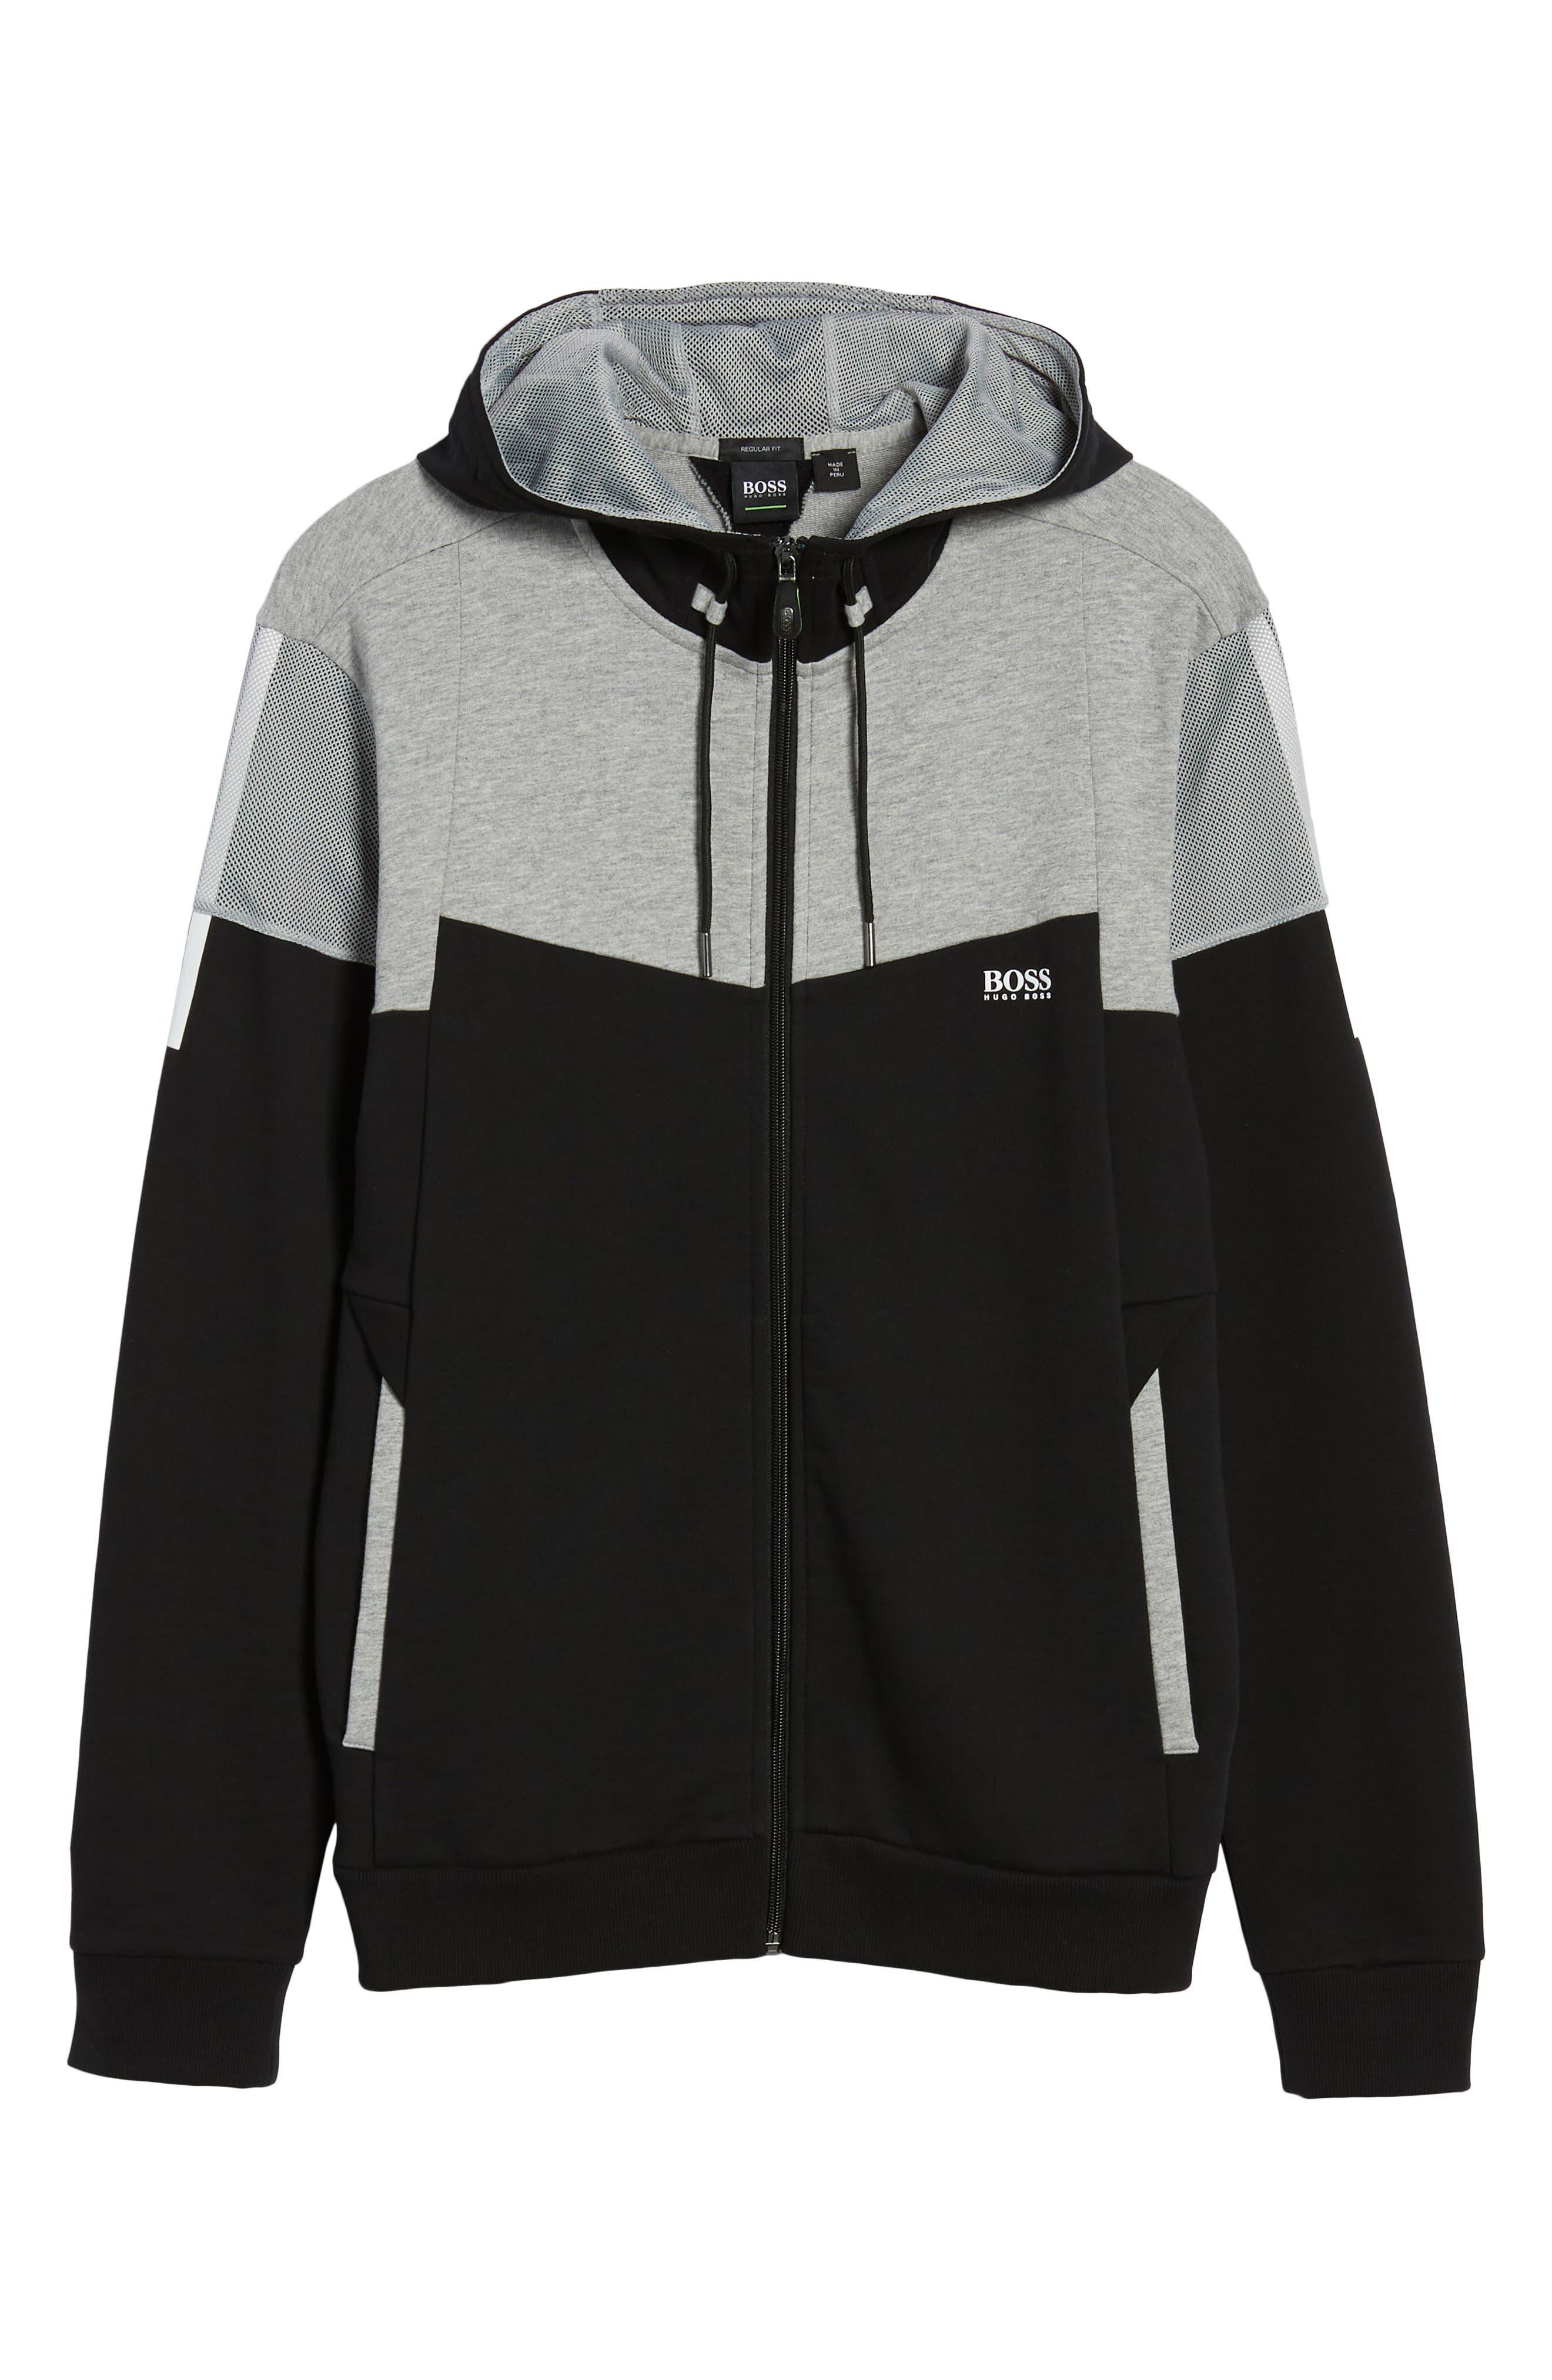 Regular Fit Hooded Fleece Jacket,                             Alternate thumbnail 6, color,                             Black